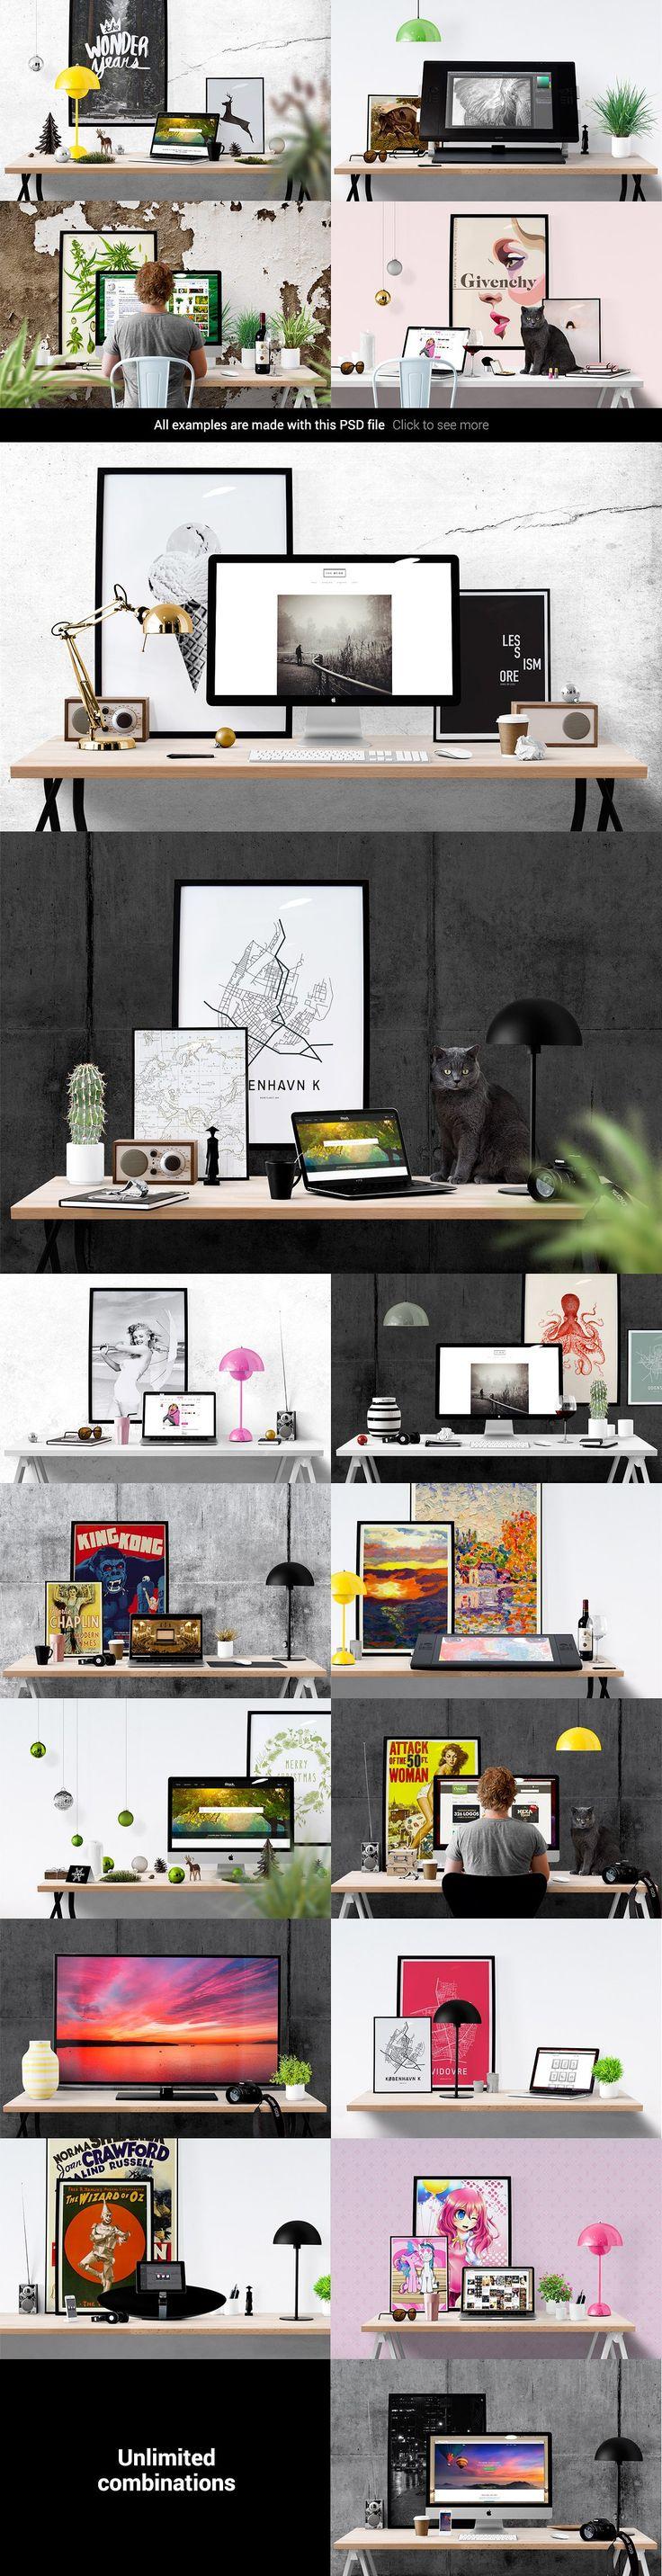 6 poster design photo mockups 57079 - Mockup Scene Creator Desk Edition By Place To On Creative Market Design Websites Poster